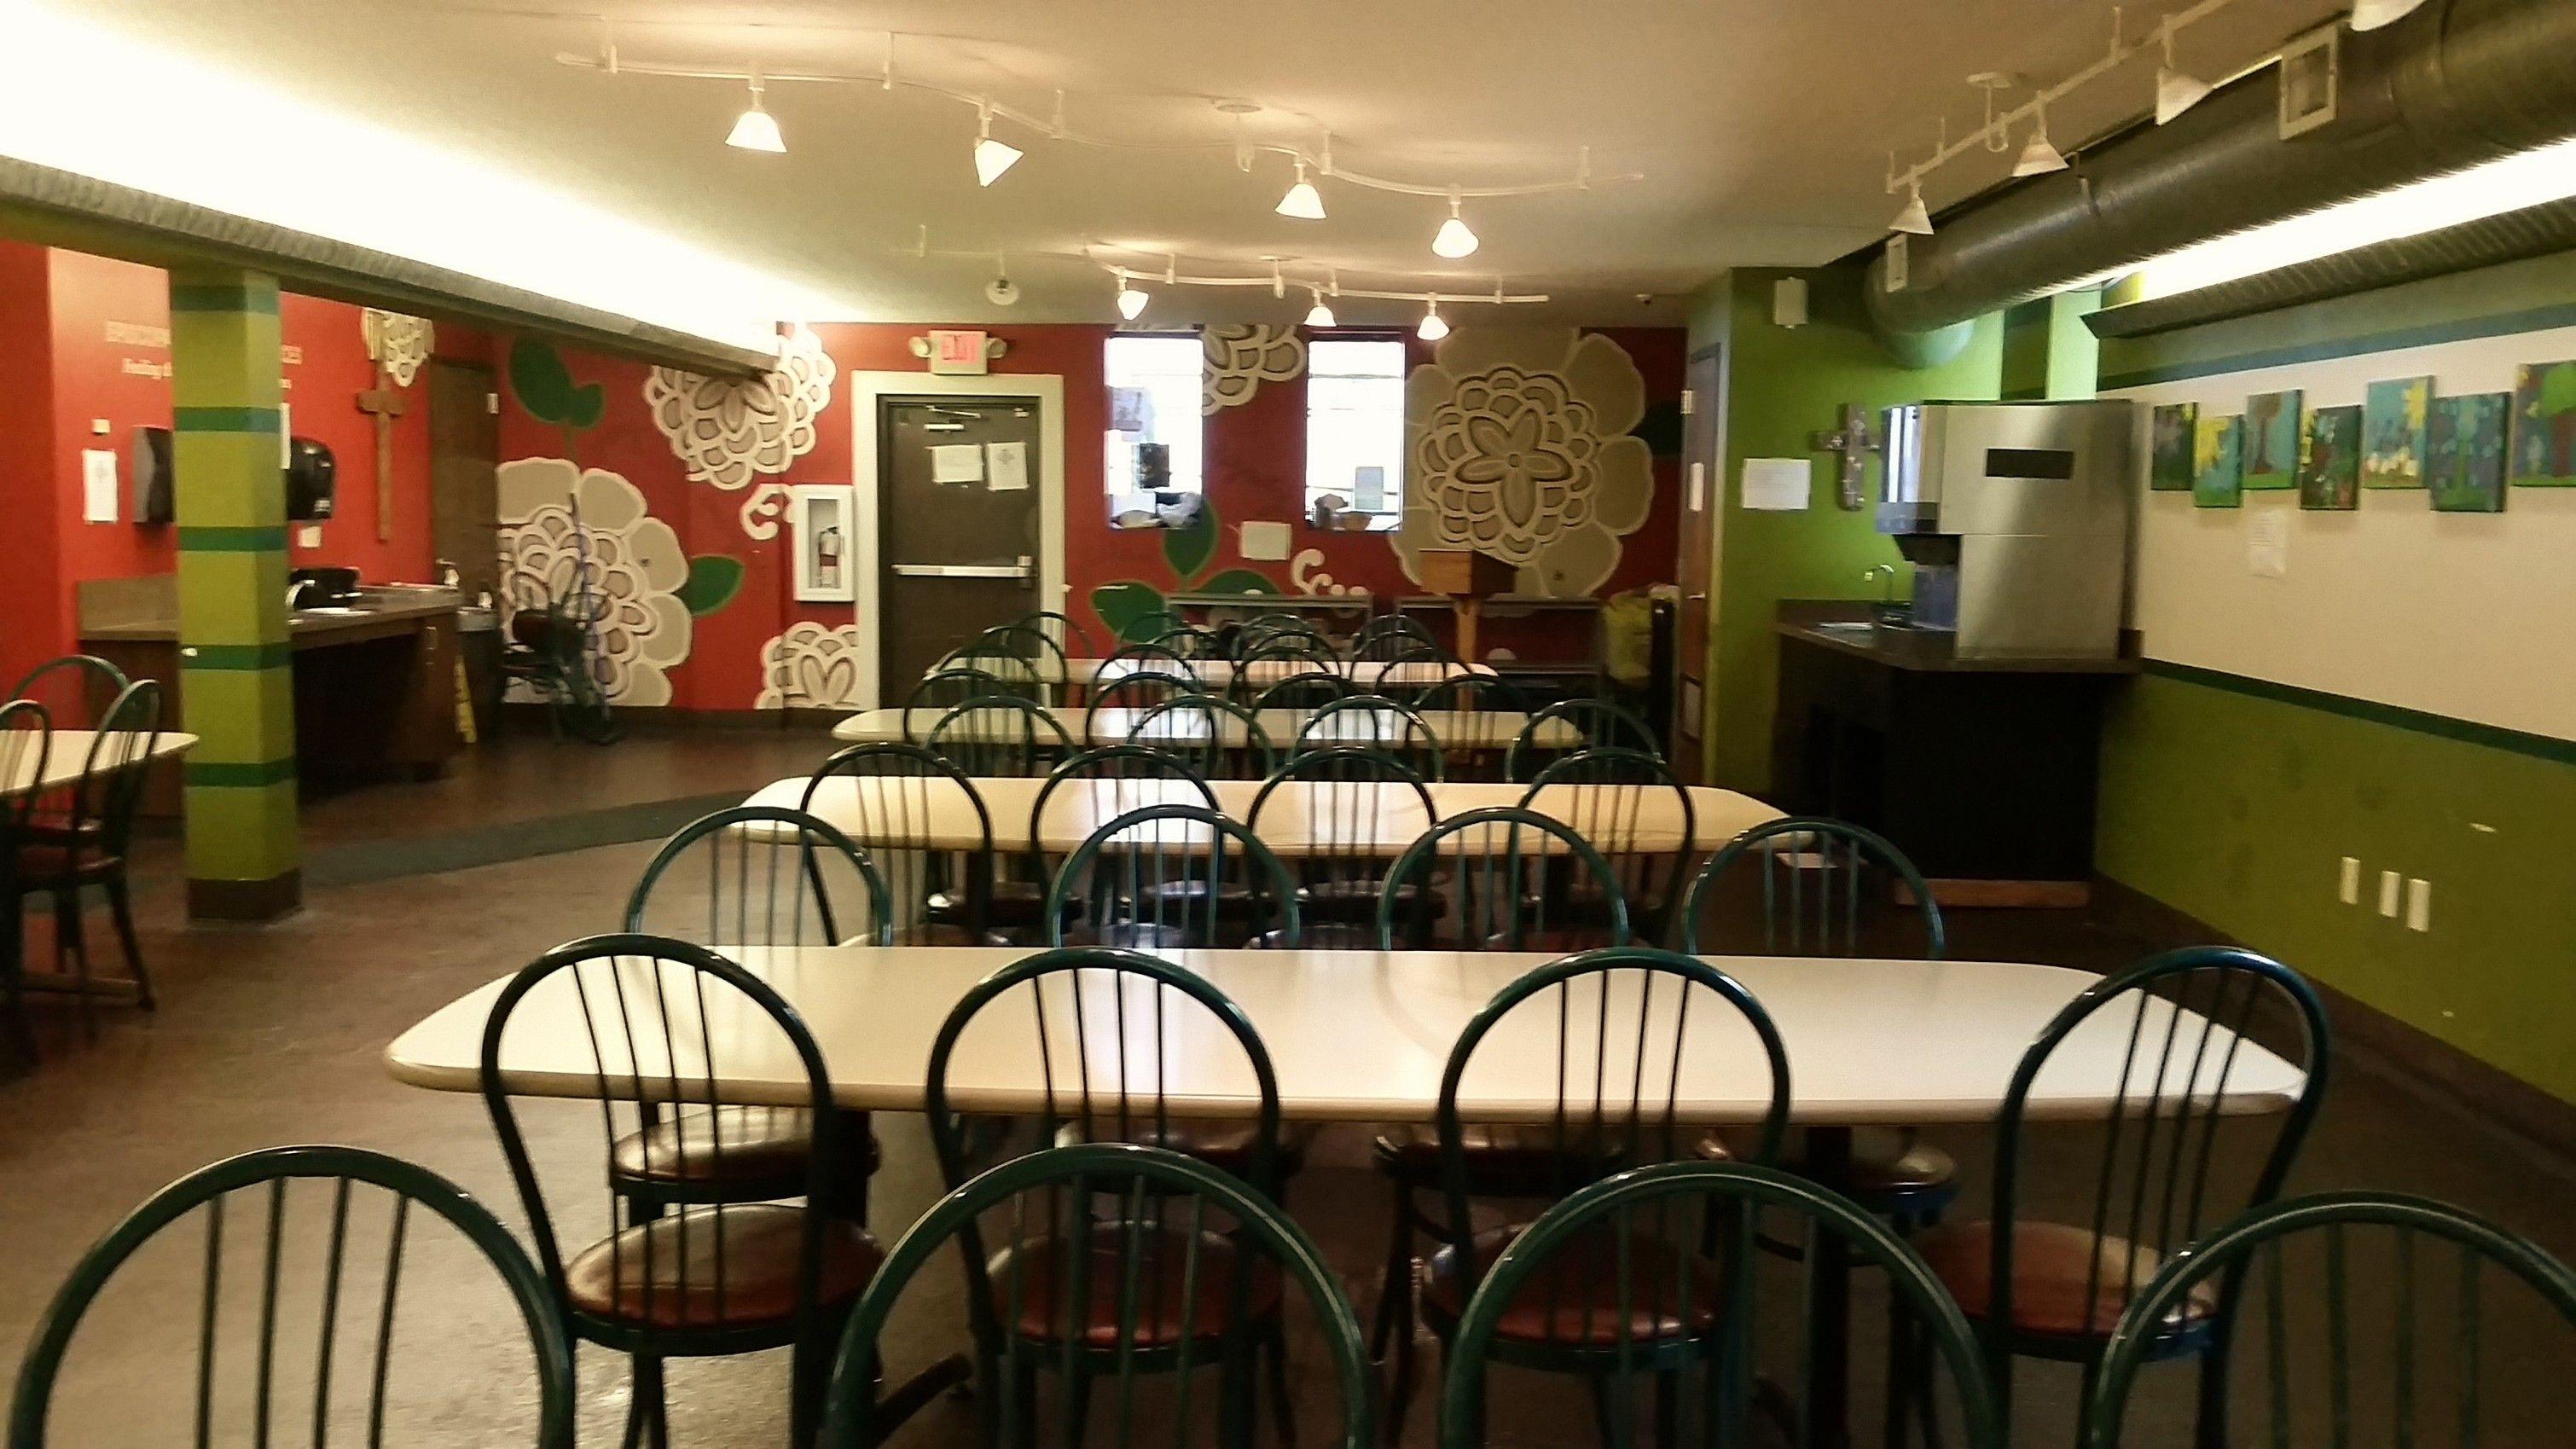 Kansas City Community Kitchen! A restaurant style soup